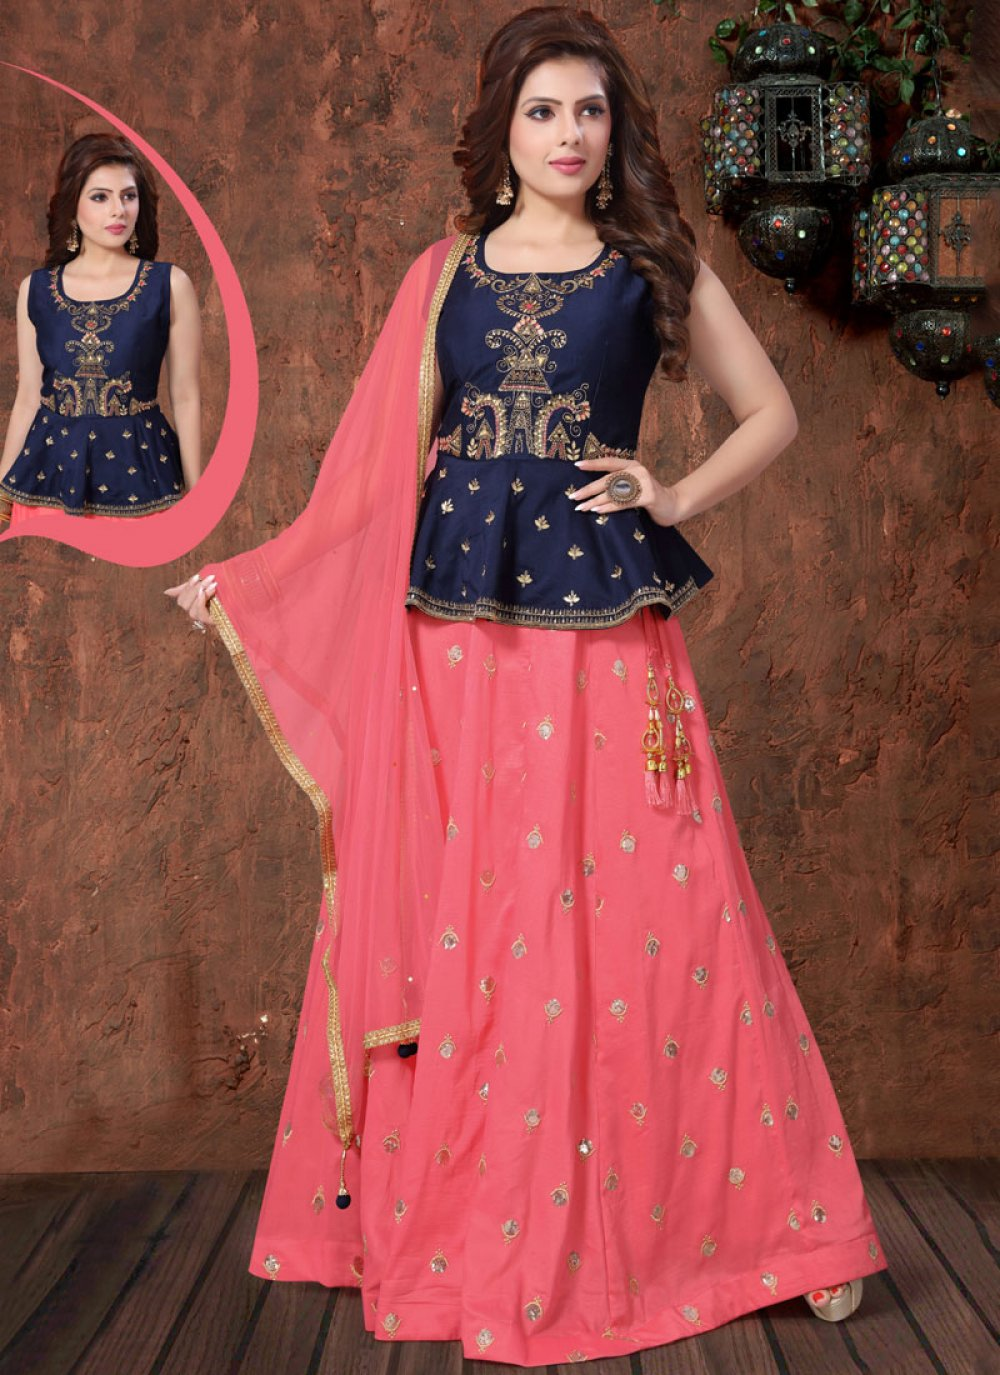 Pink Embroidered Sangeet Readymade Lehenga Choli